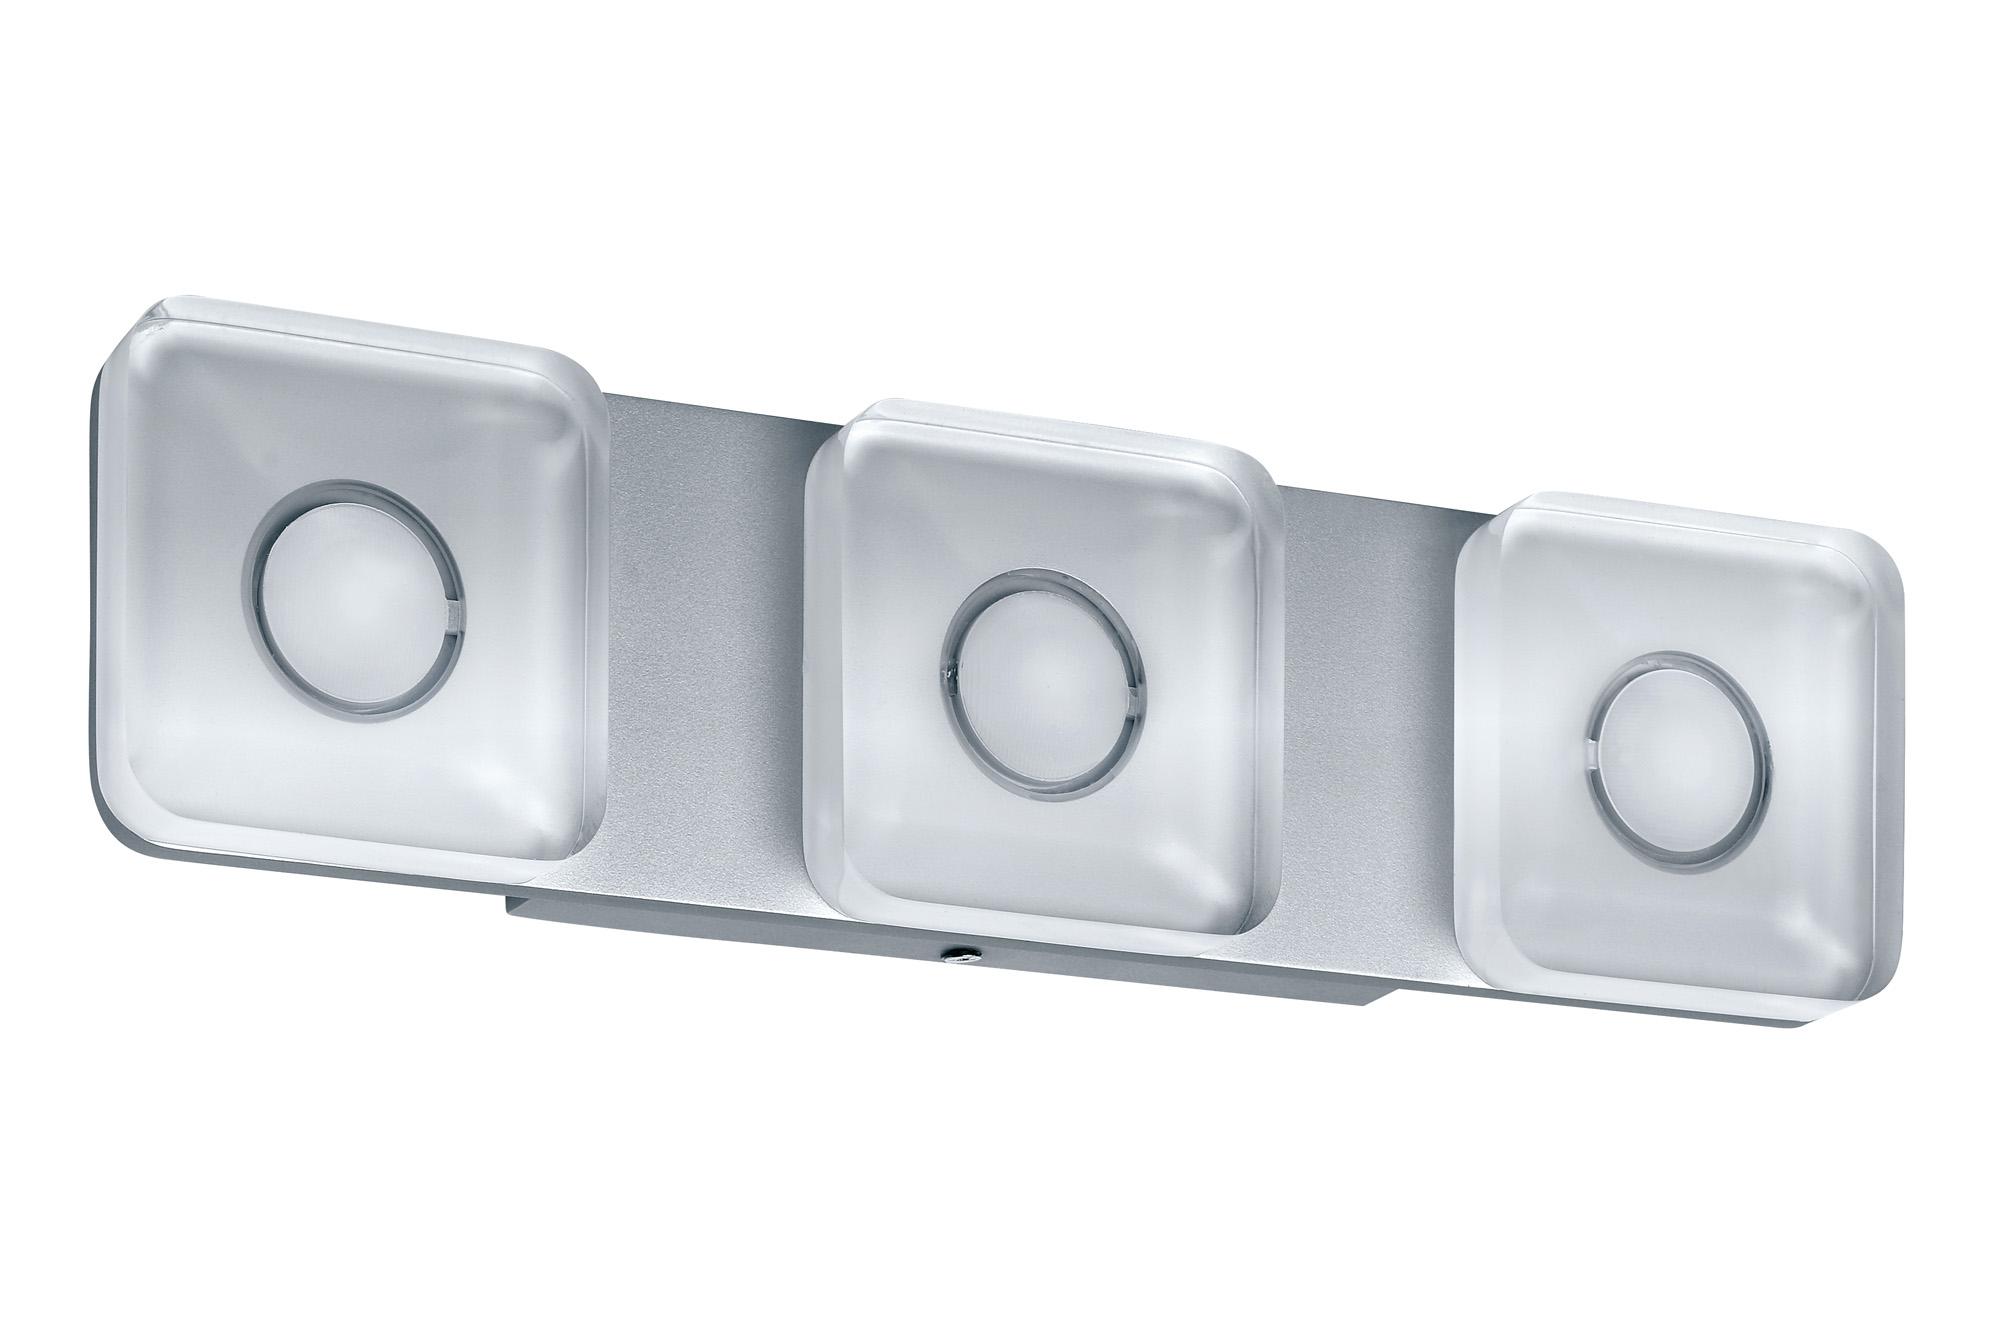 led wandleuchte tucana eckig 13 5w aluminium klar 70474. Black Bedroom Furniture Sets. Home Design Ideas